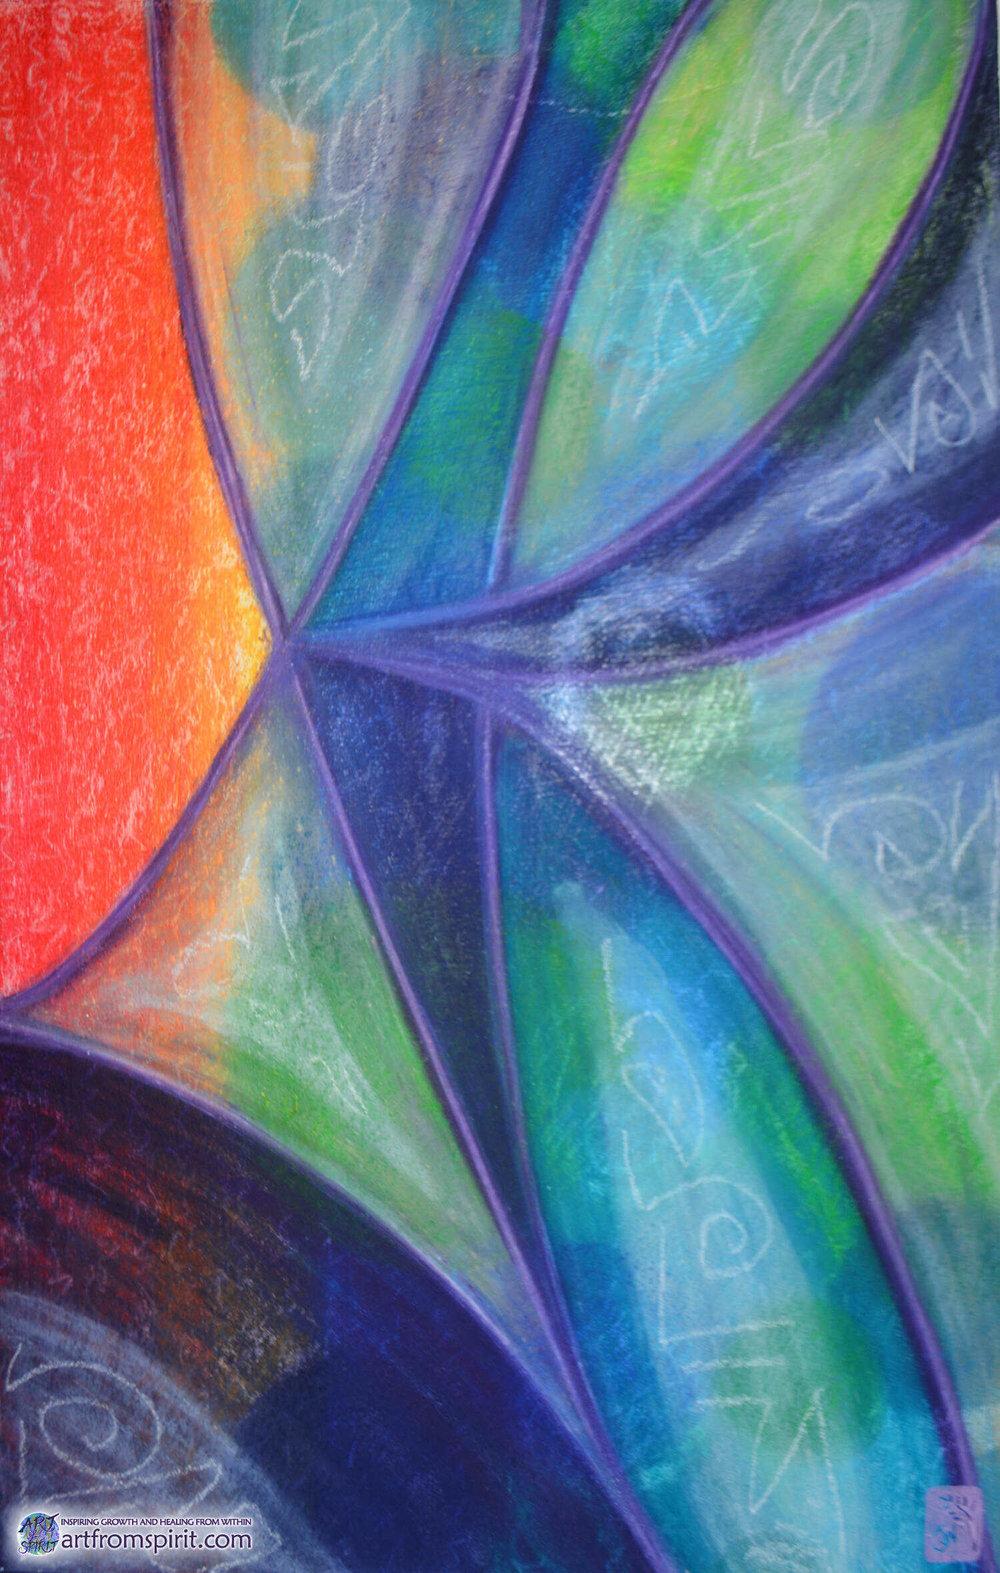 joy-within-intuitive-spiritual-art-art-from-spirit-tegan-neville.jpg